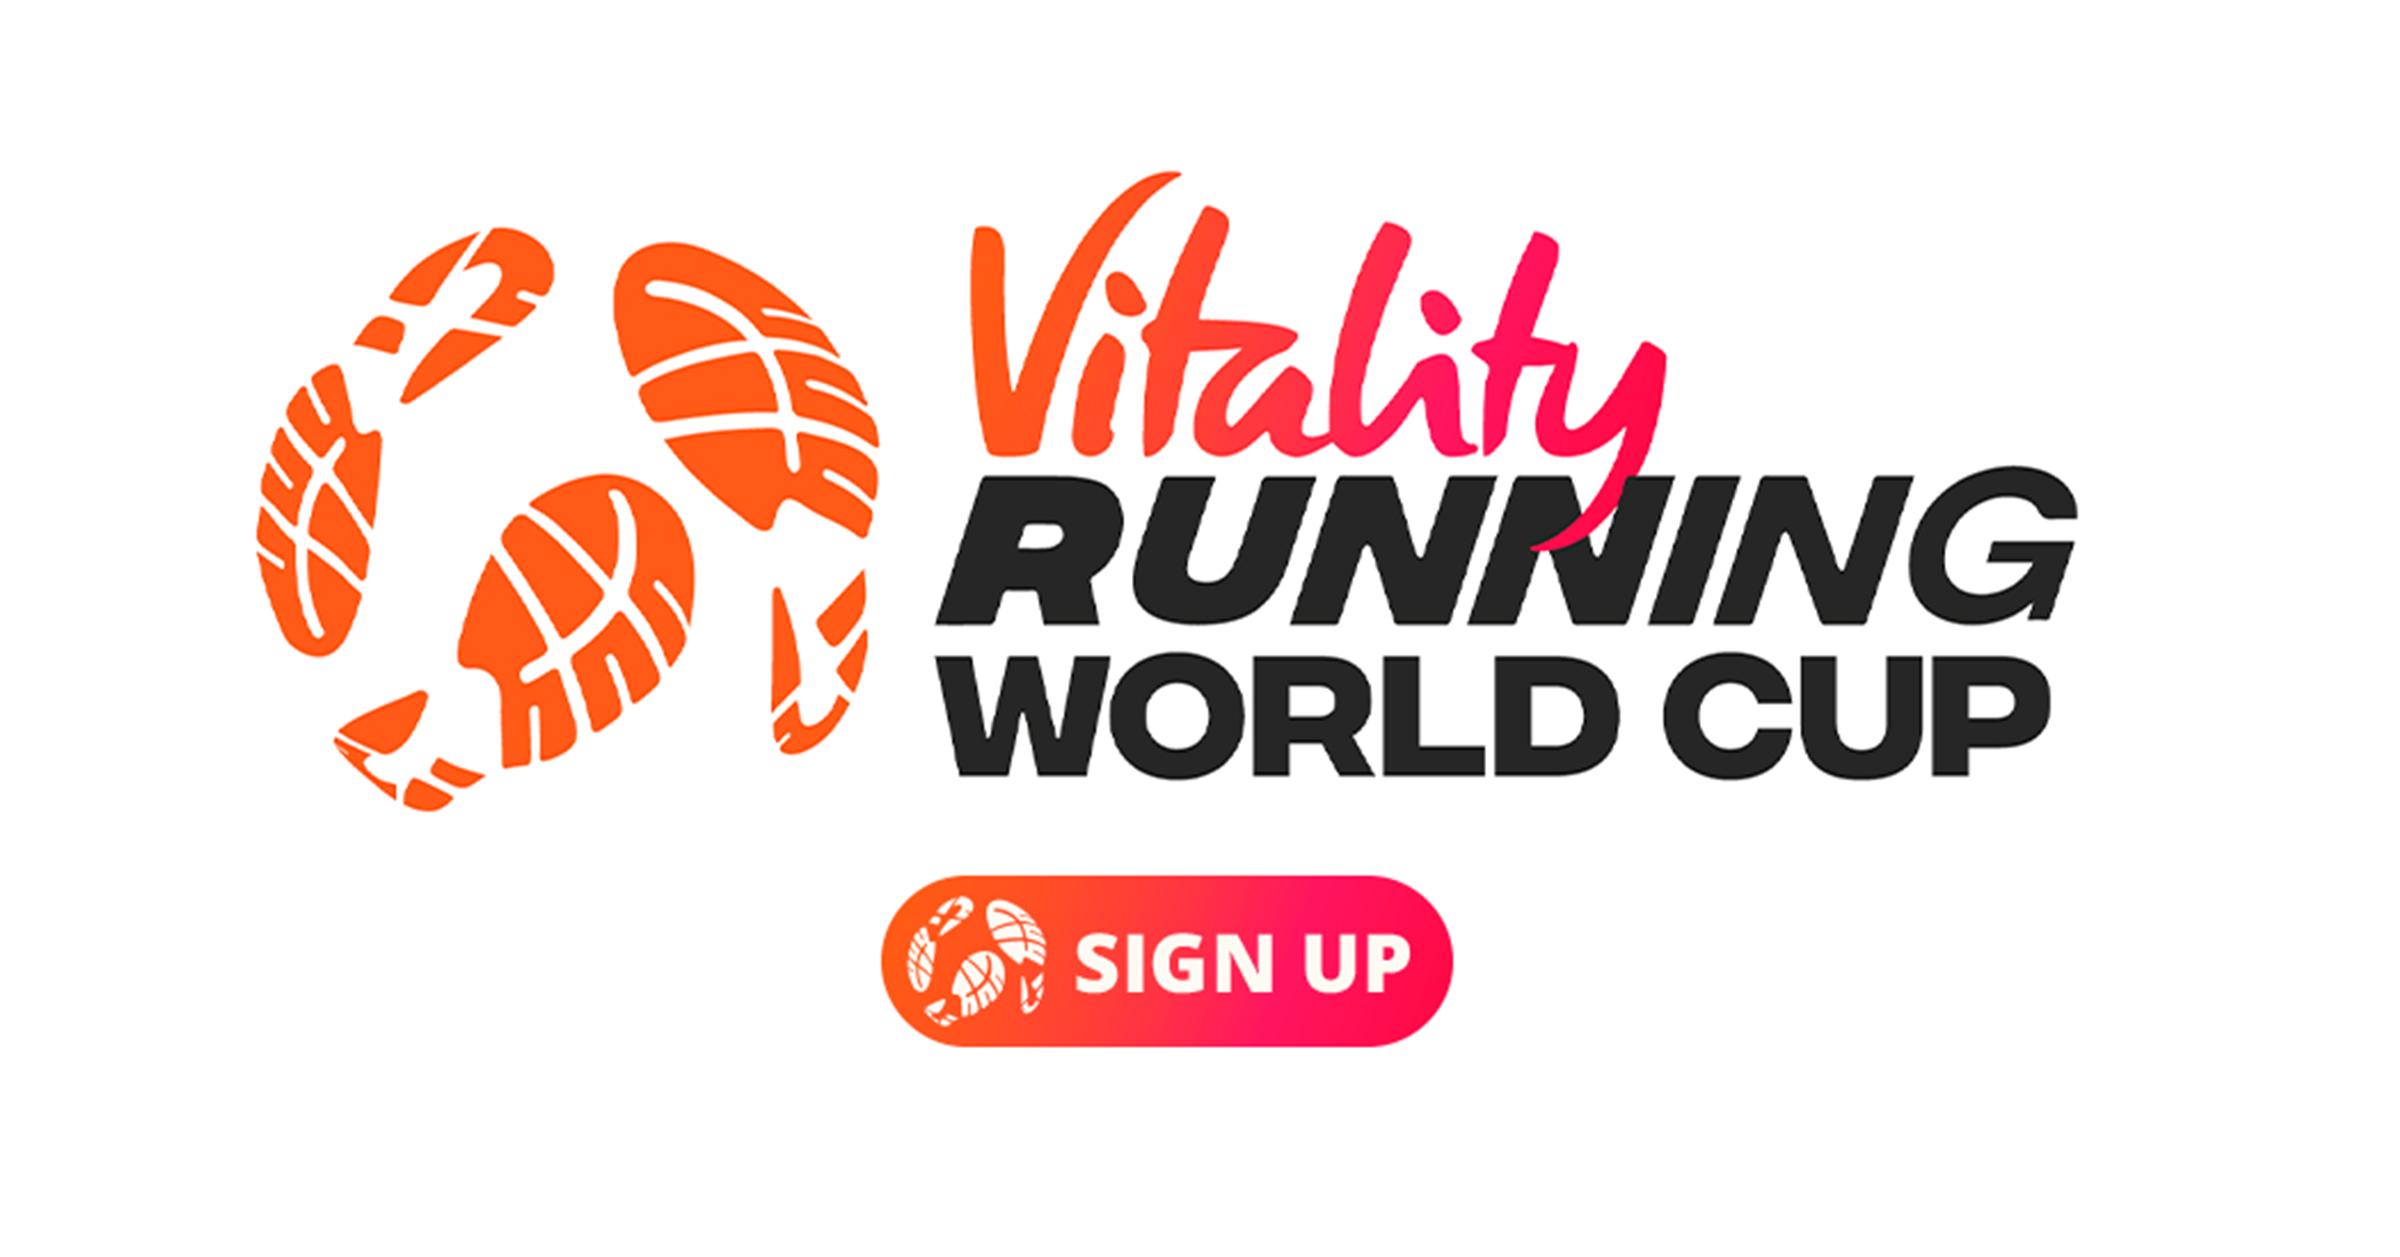 app.runningworldcup.com